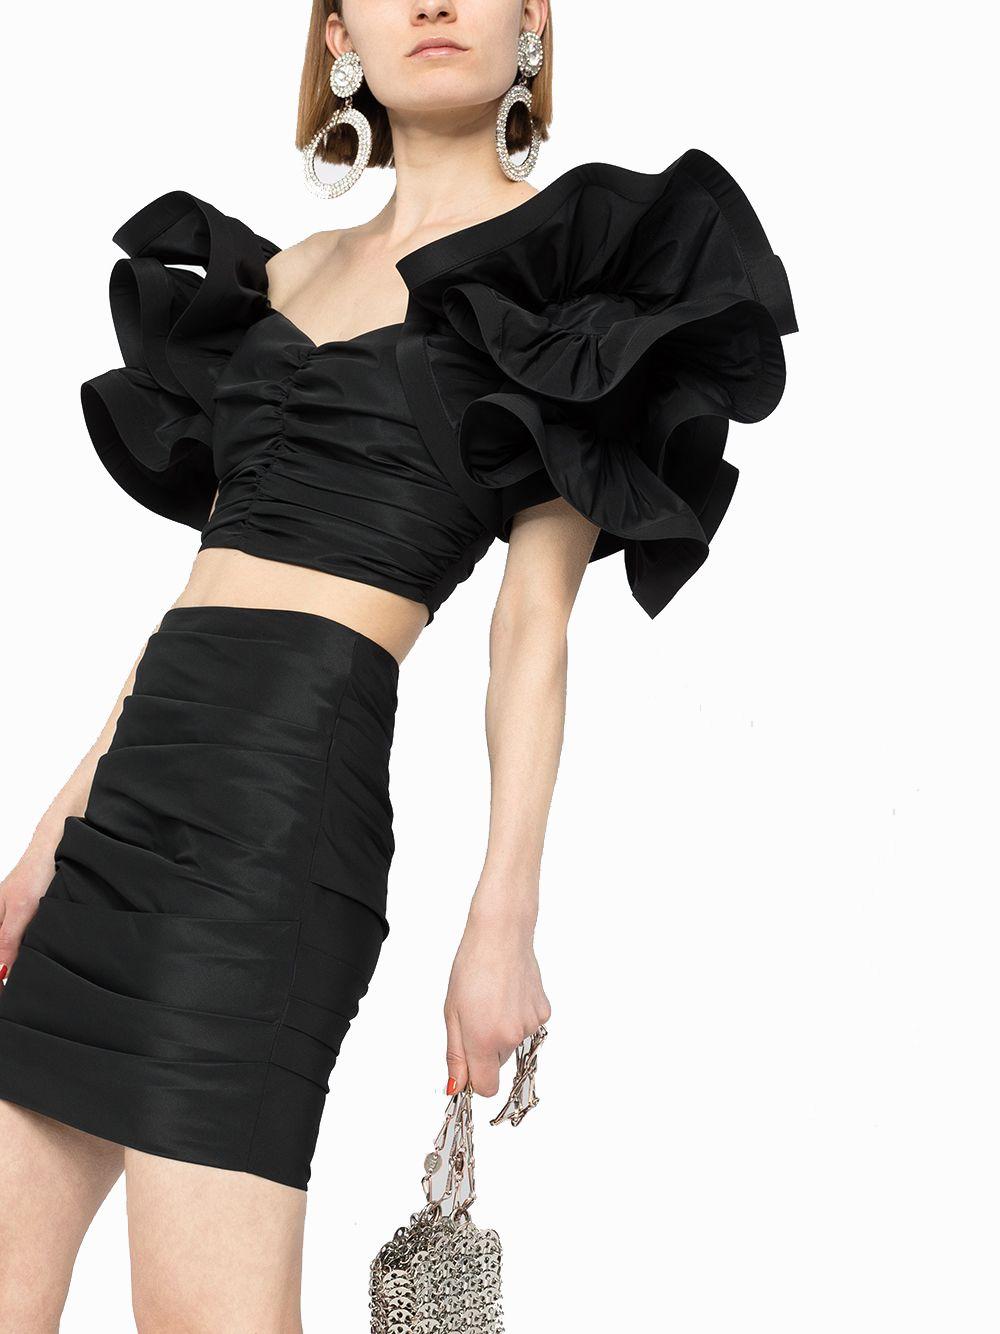 ELISABETTA FRANCHI Dresses ELISABETTA FRANCHI WOMEN'S BLACK POLYESTER DRESS